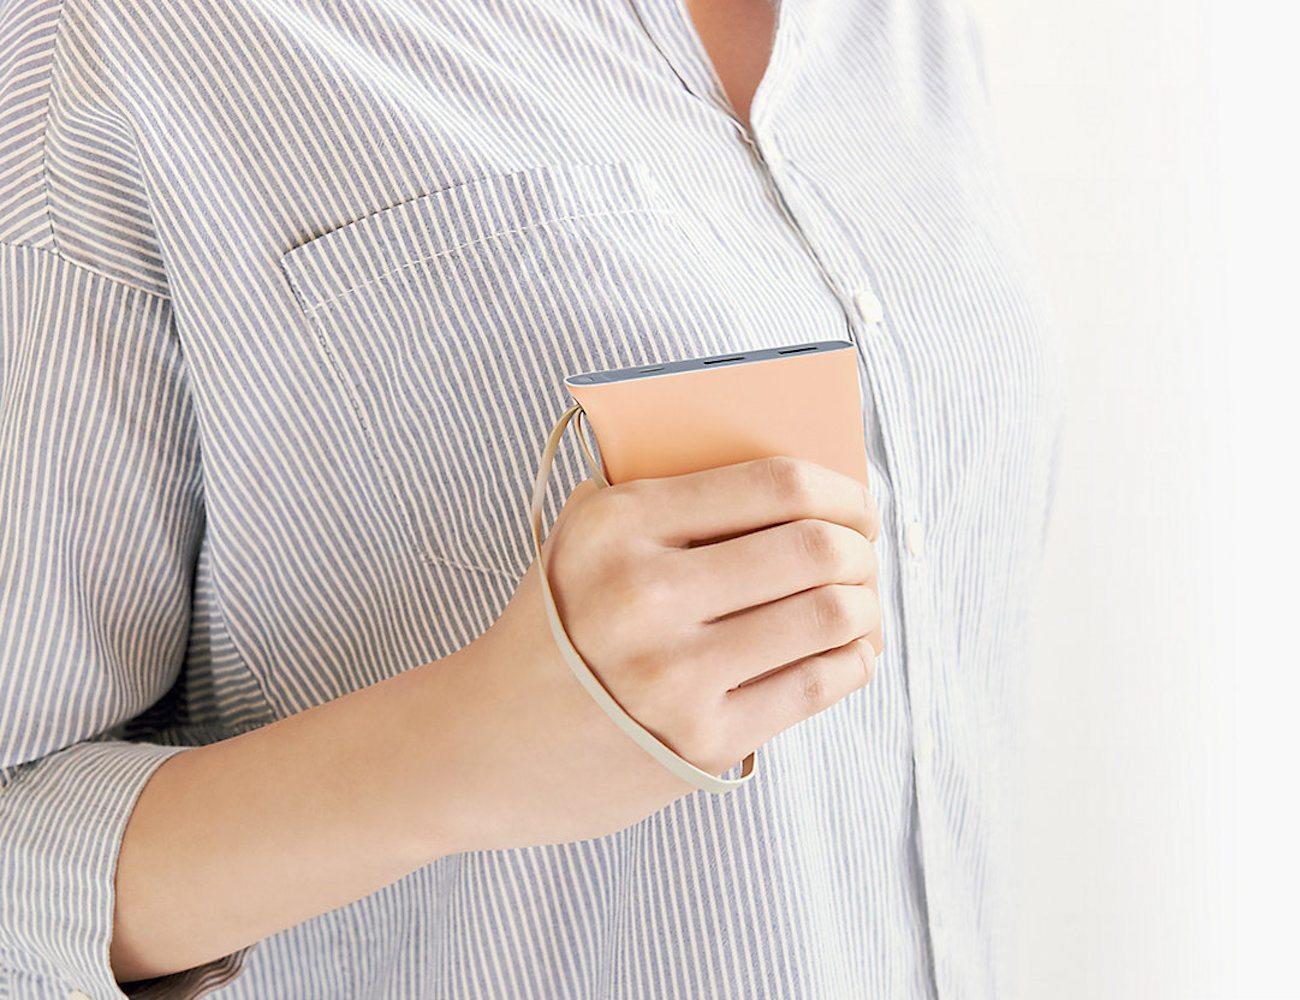 Samsung Kettle Battery Pack